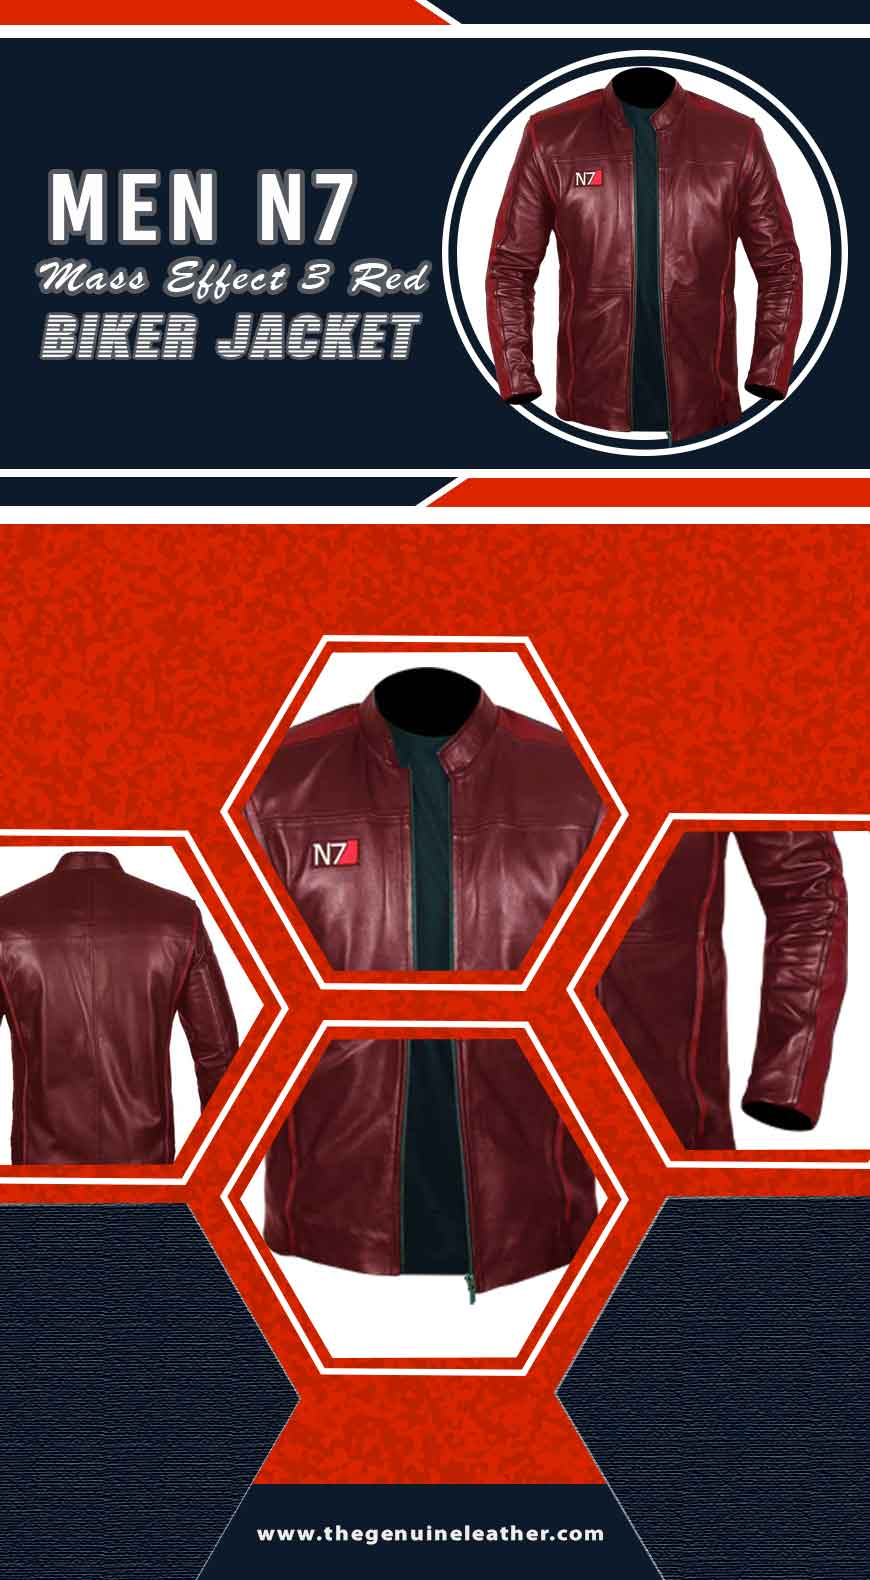 Men N7 Mass Effect 3 Red Biker Jacket